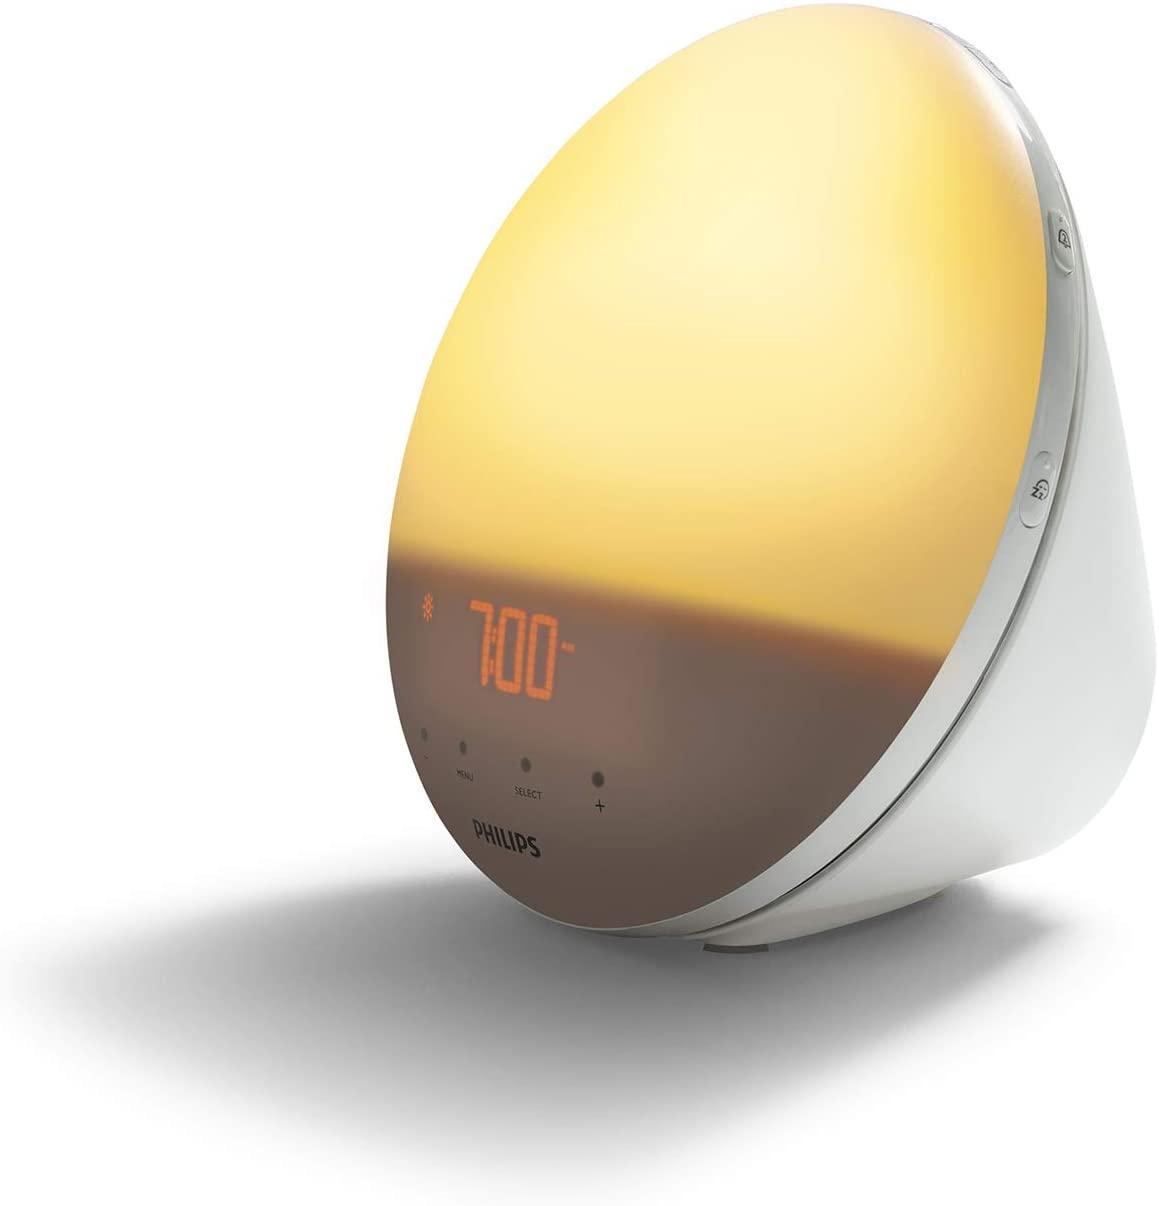 Philips Wake-up Light amazon